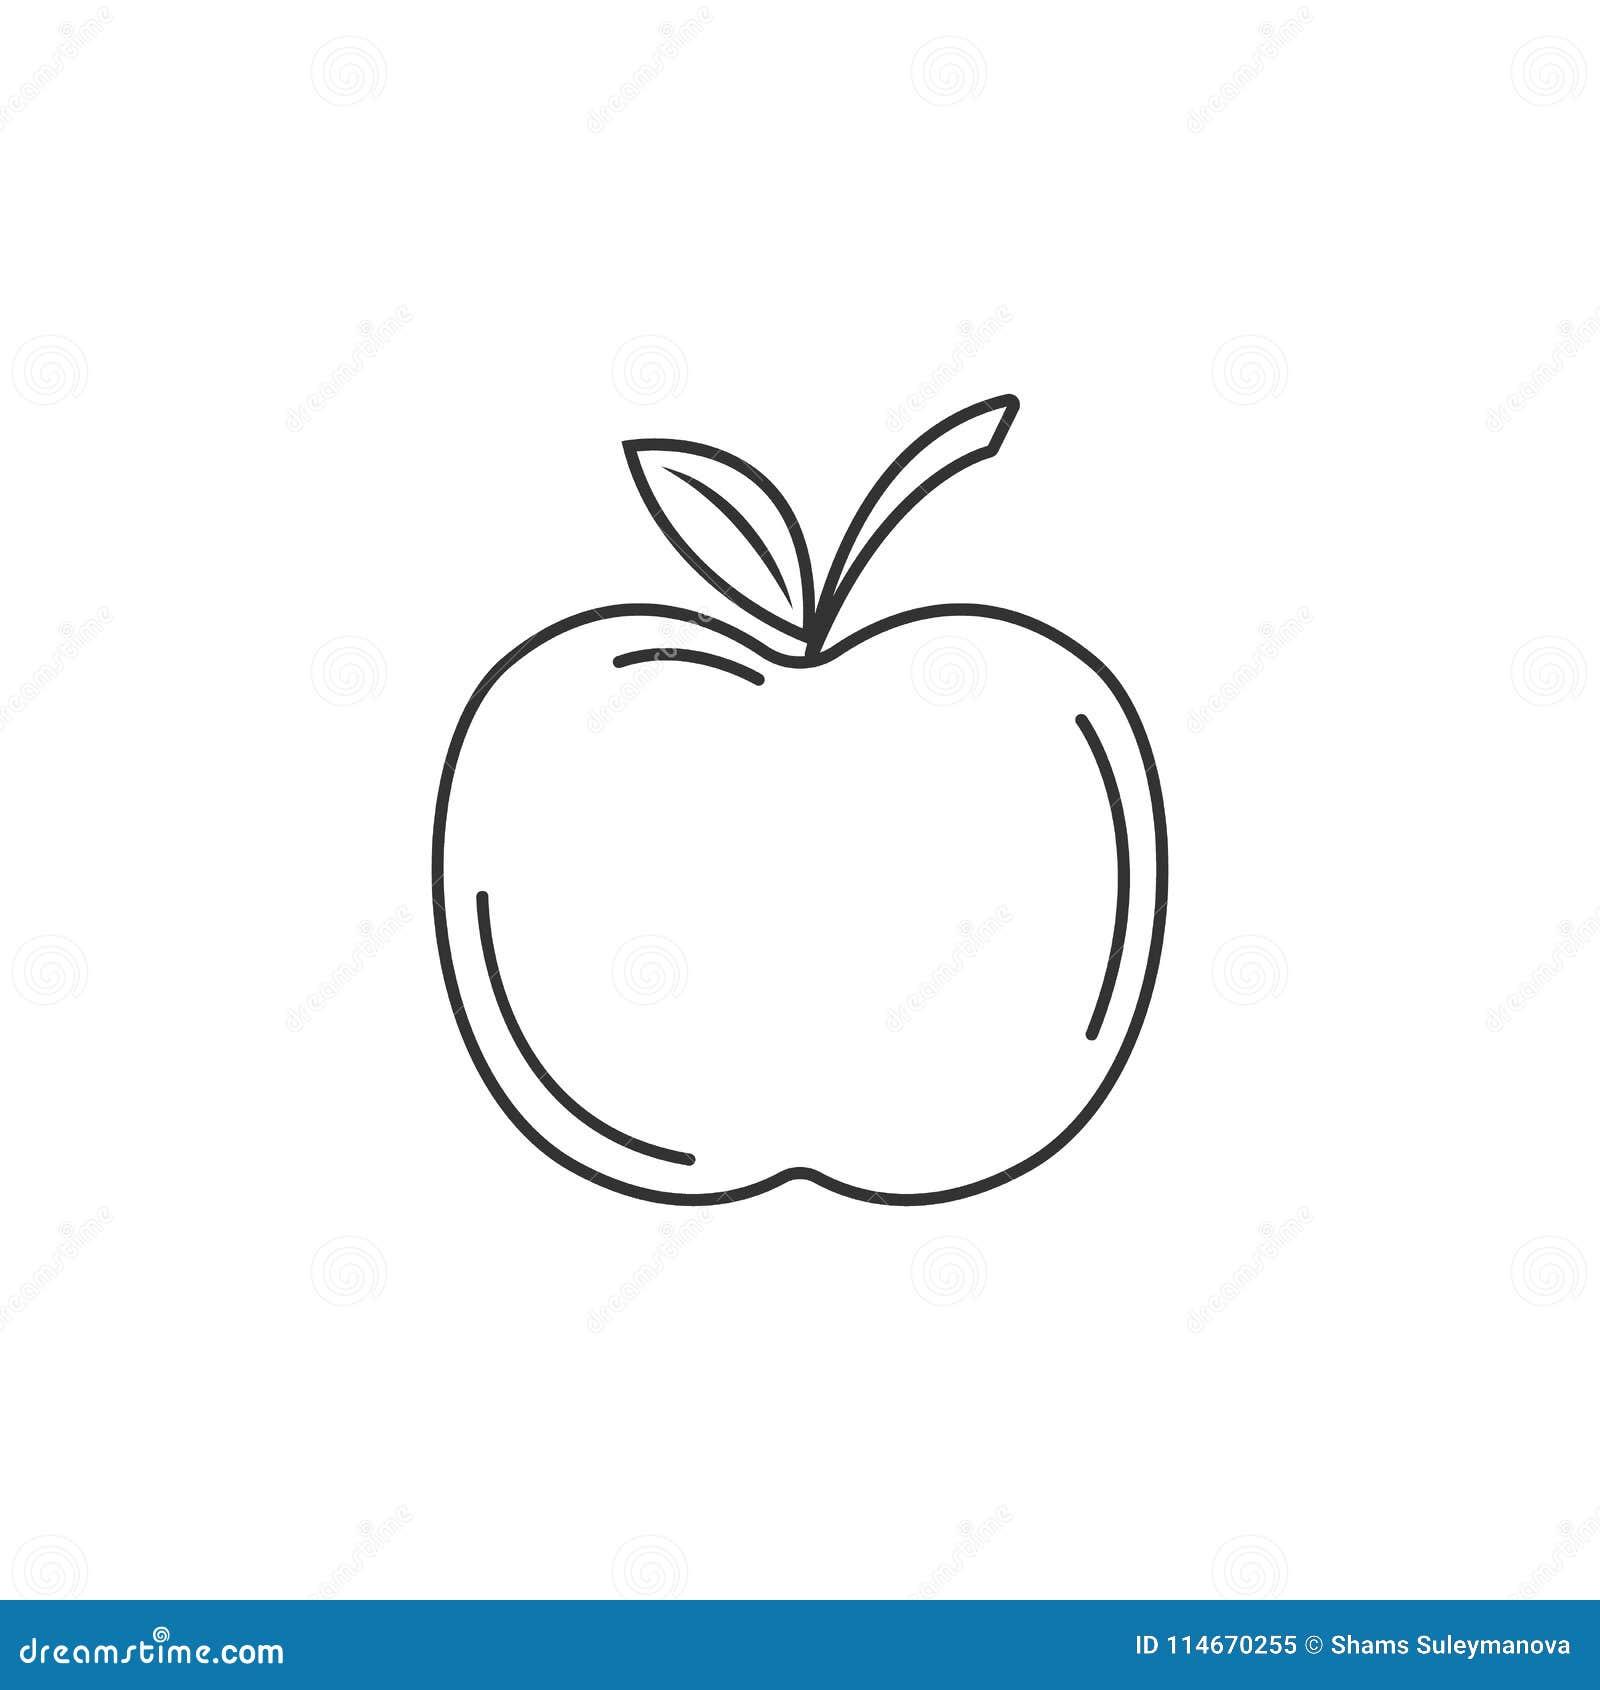 apple icon simple element illustration apple symbol design